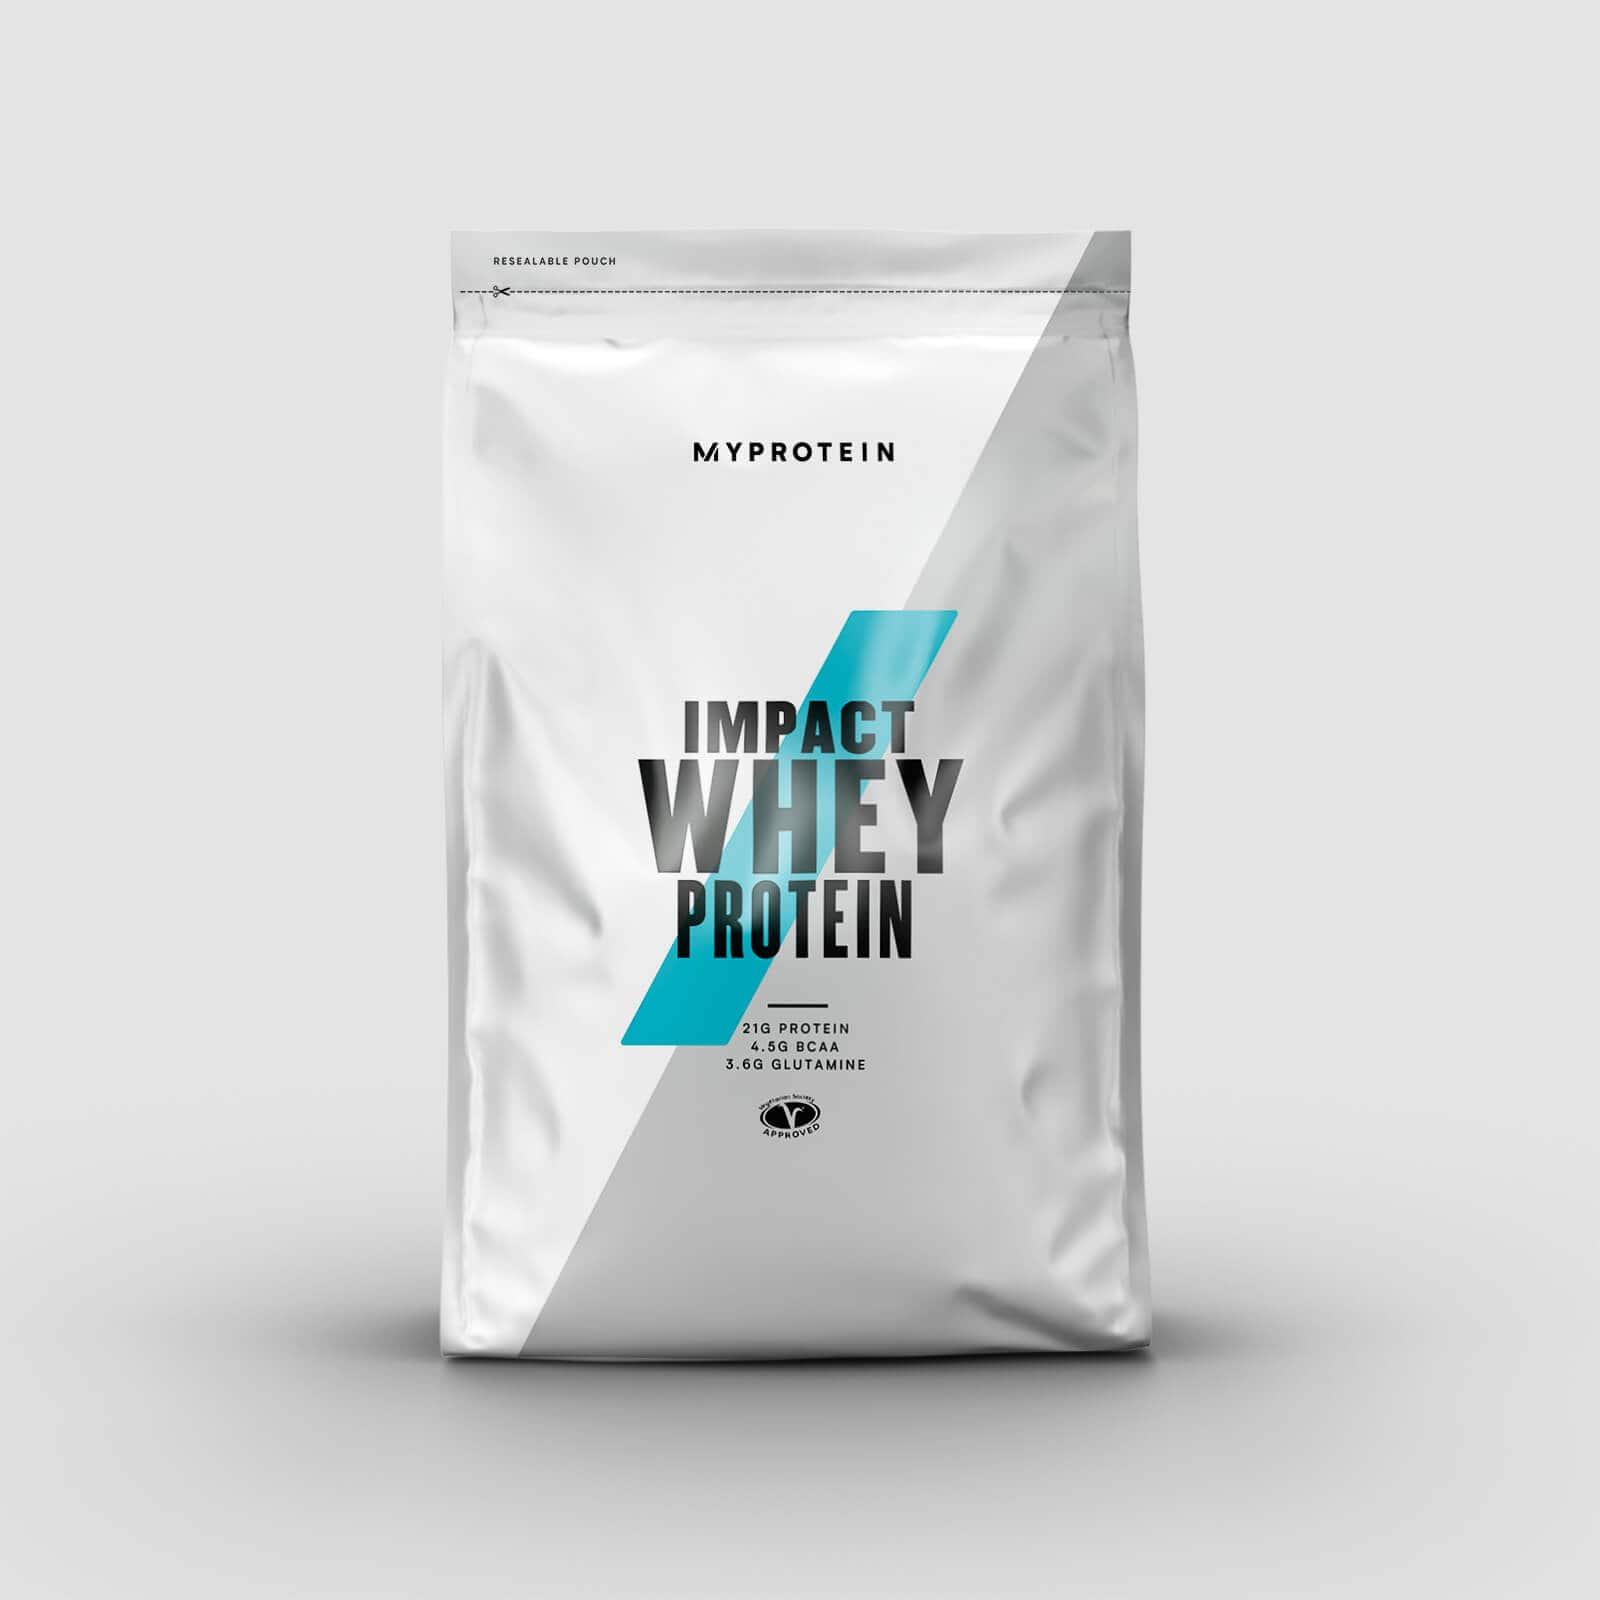 11lbs Impact Whey Protein + 0.5lb Creatine Monohydrate + Shaker